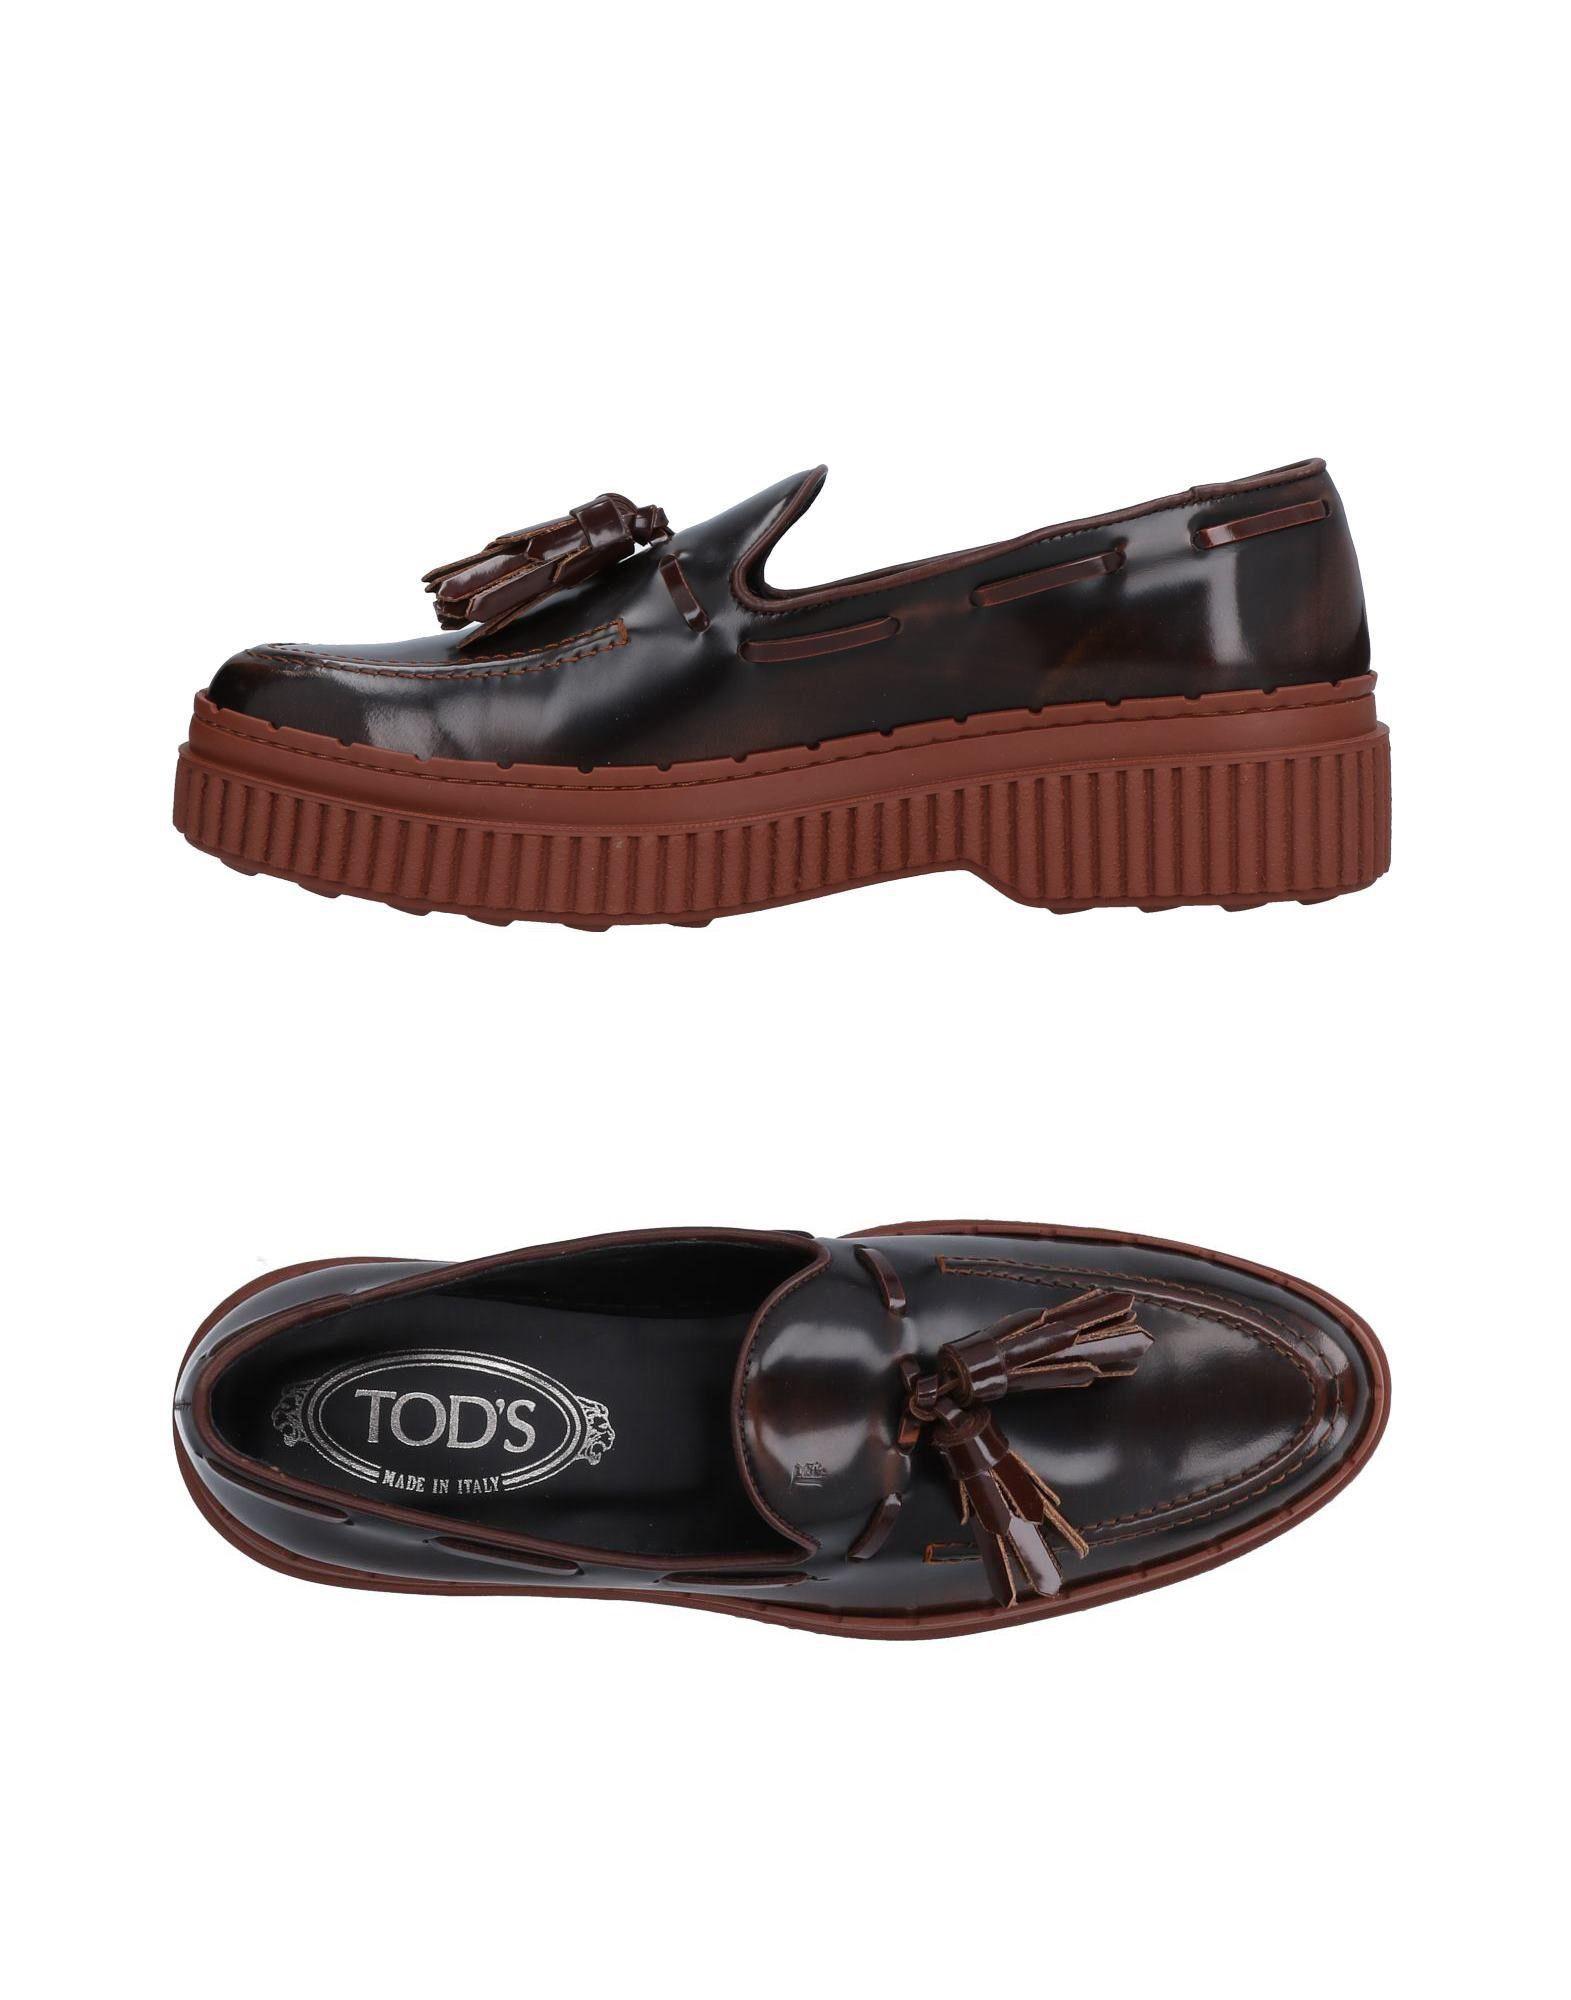 Moda Mocassino Tod's Donna - 11503606CJ